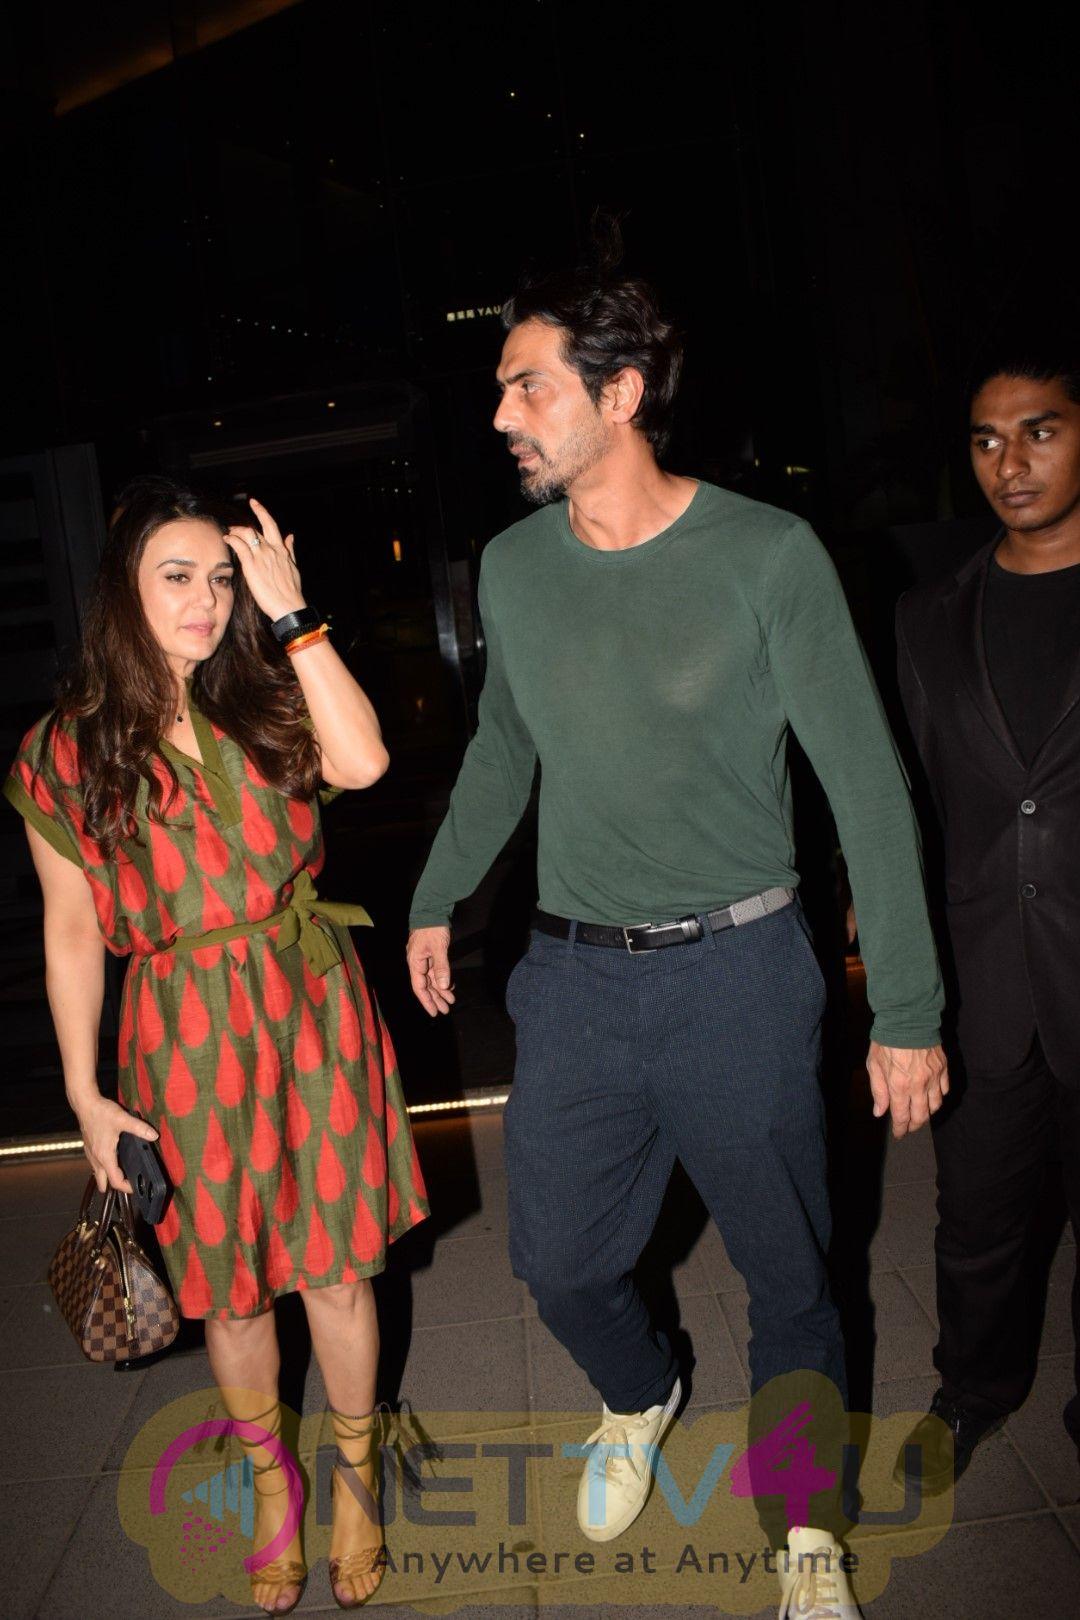 Preity Zinta & Arjun Rampal Came To Yautcha Bkc Hindi Gallery